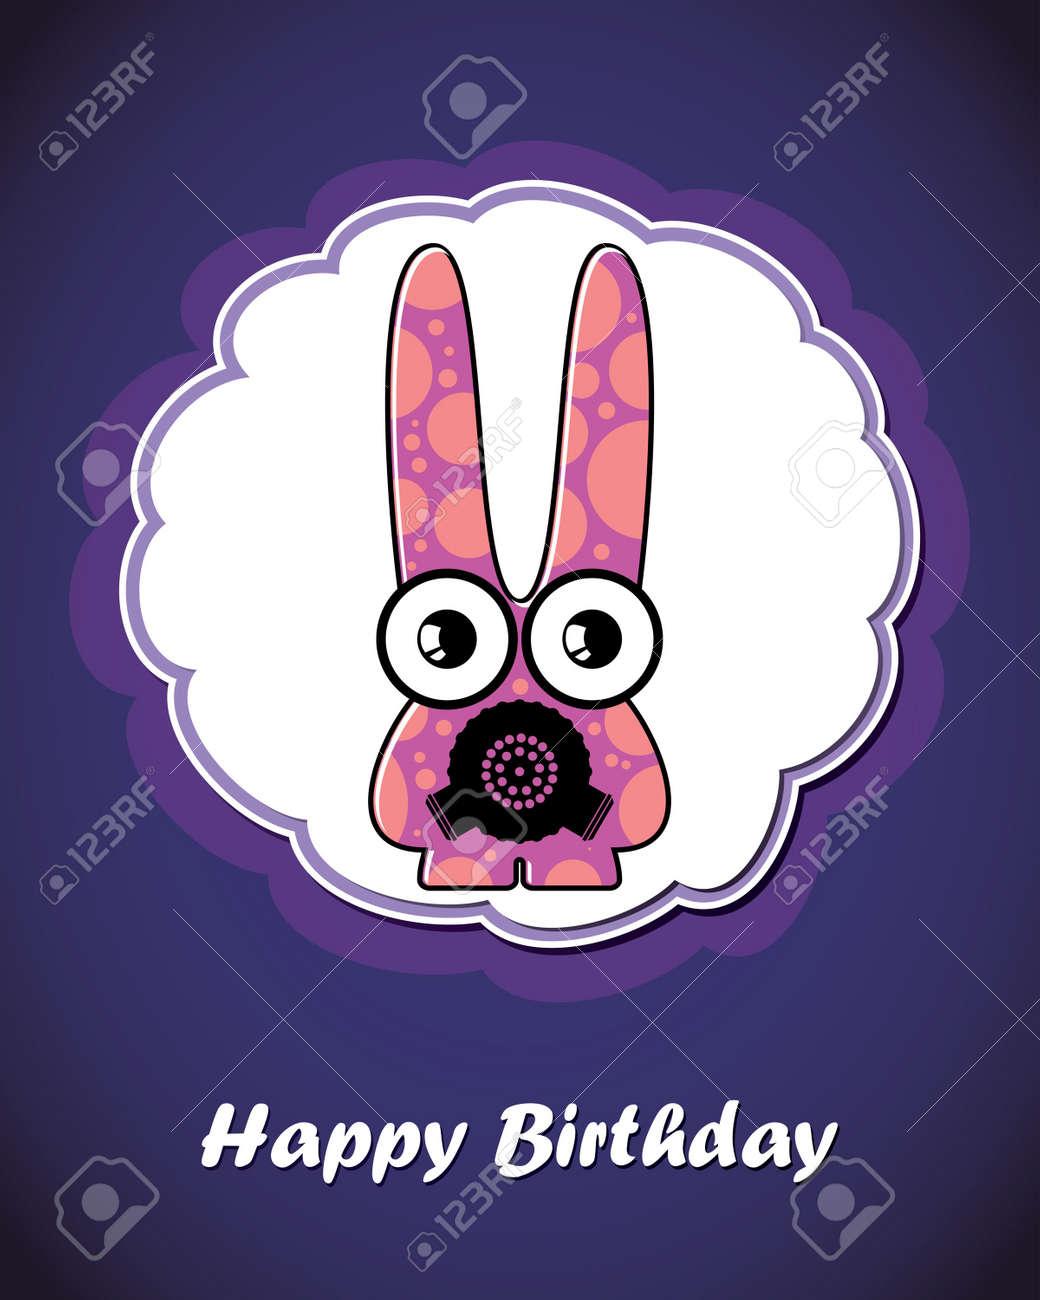 Happy birthday card with cute cartoon monster Stock Vector - 17577650